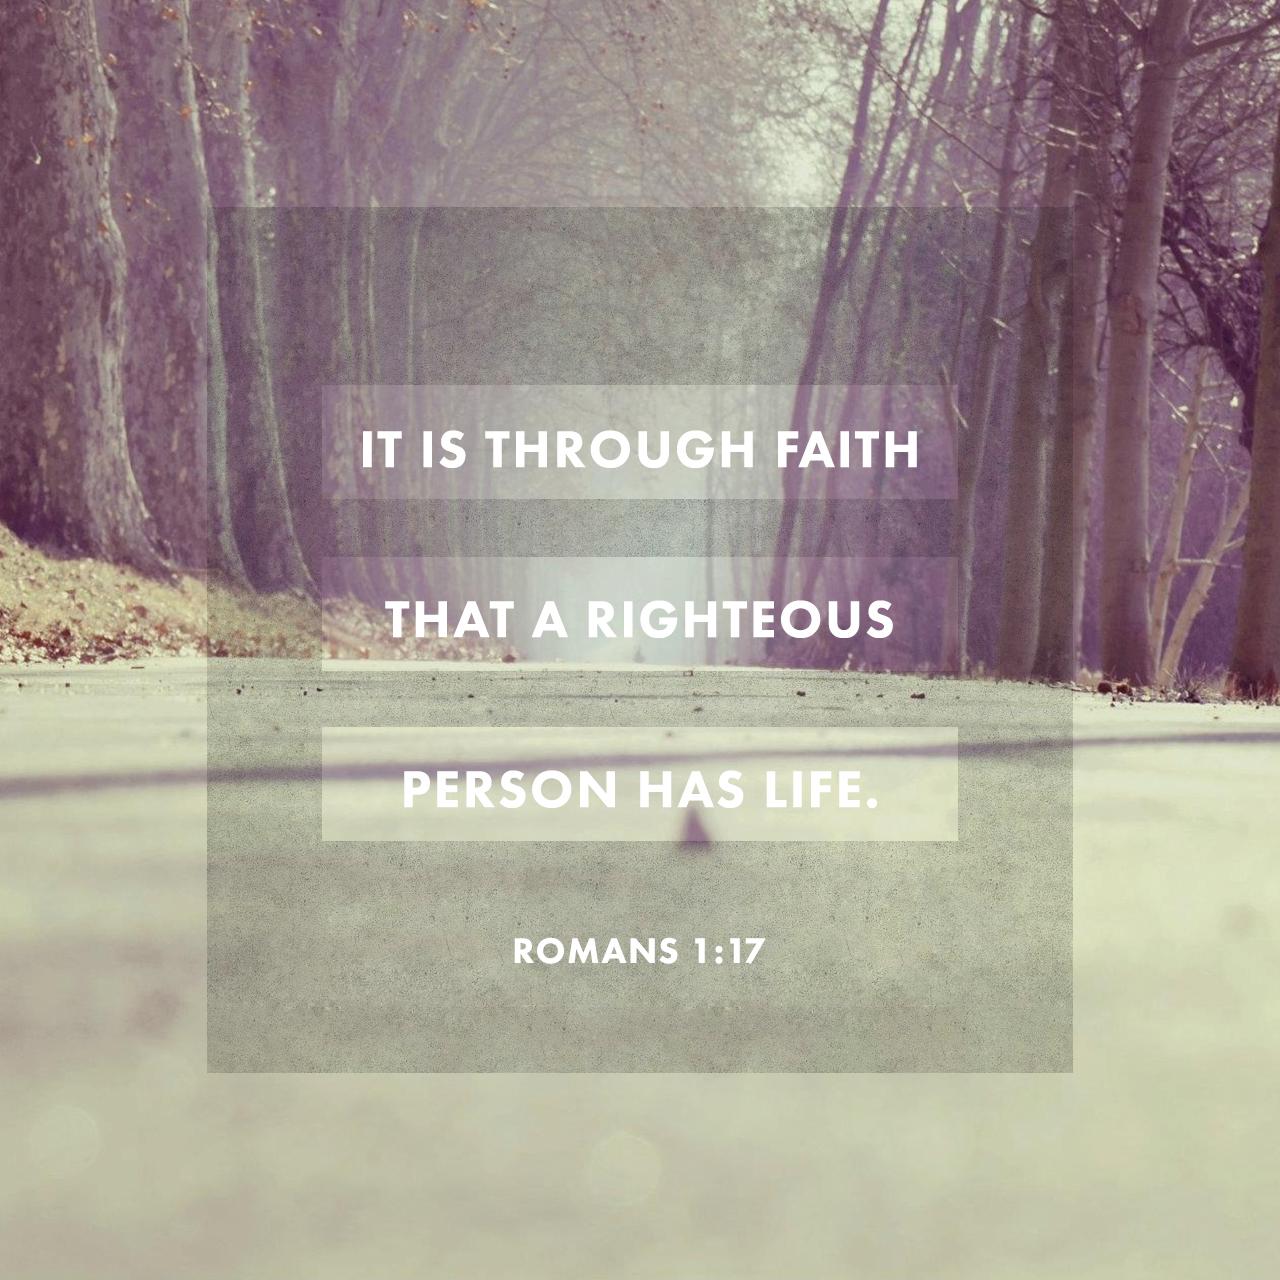 Romans 1:17 (JPG)